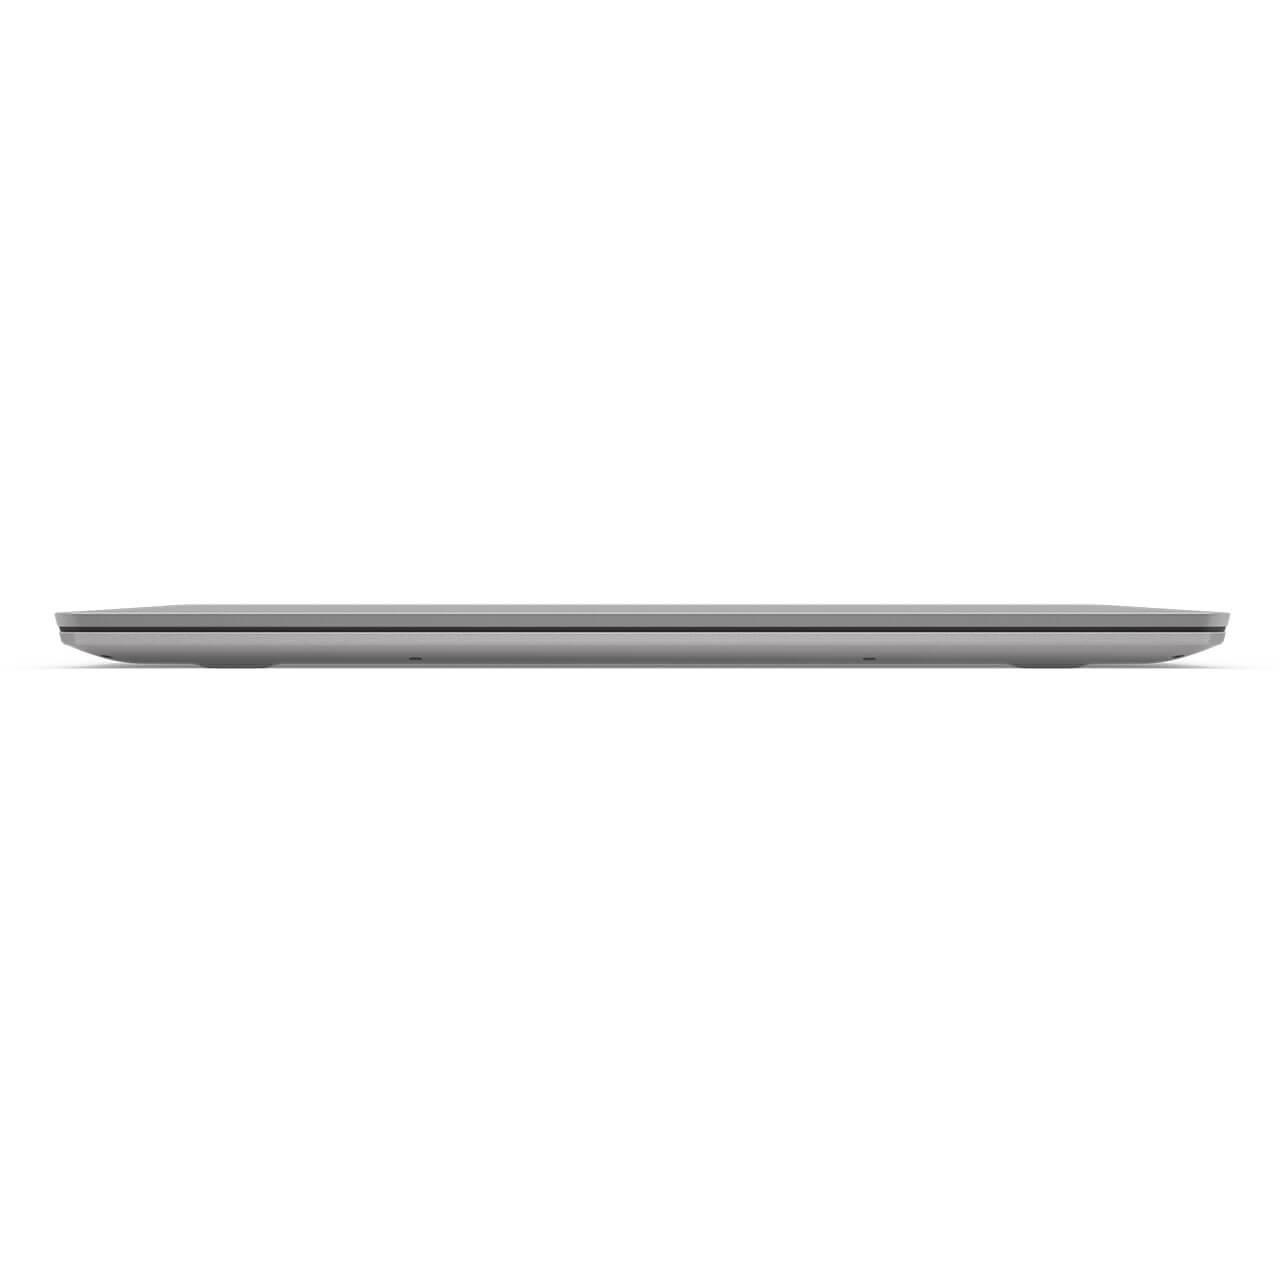 "Lenovo Ideapad 530S, 15.6"", i7-8550U, 8 GB RAM, 512GB SSD, Win 10 Home 64 7"